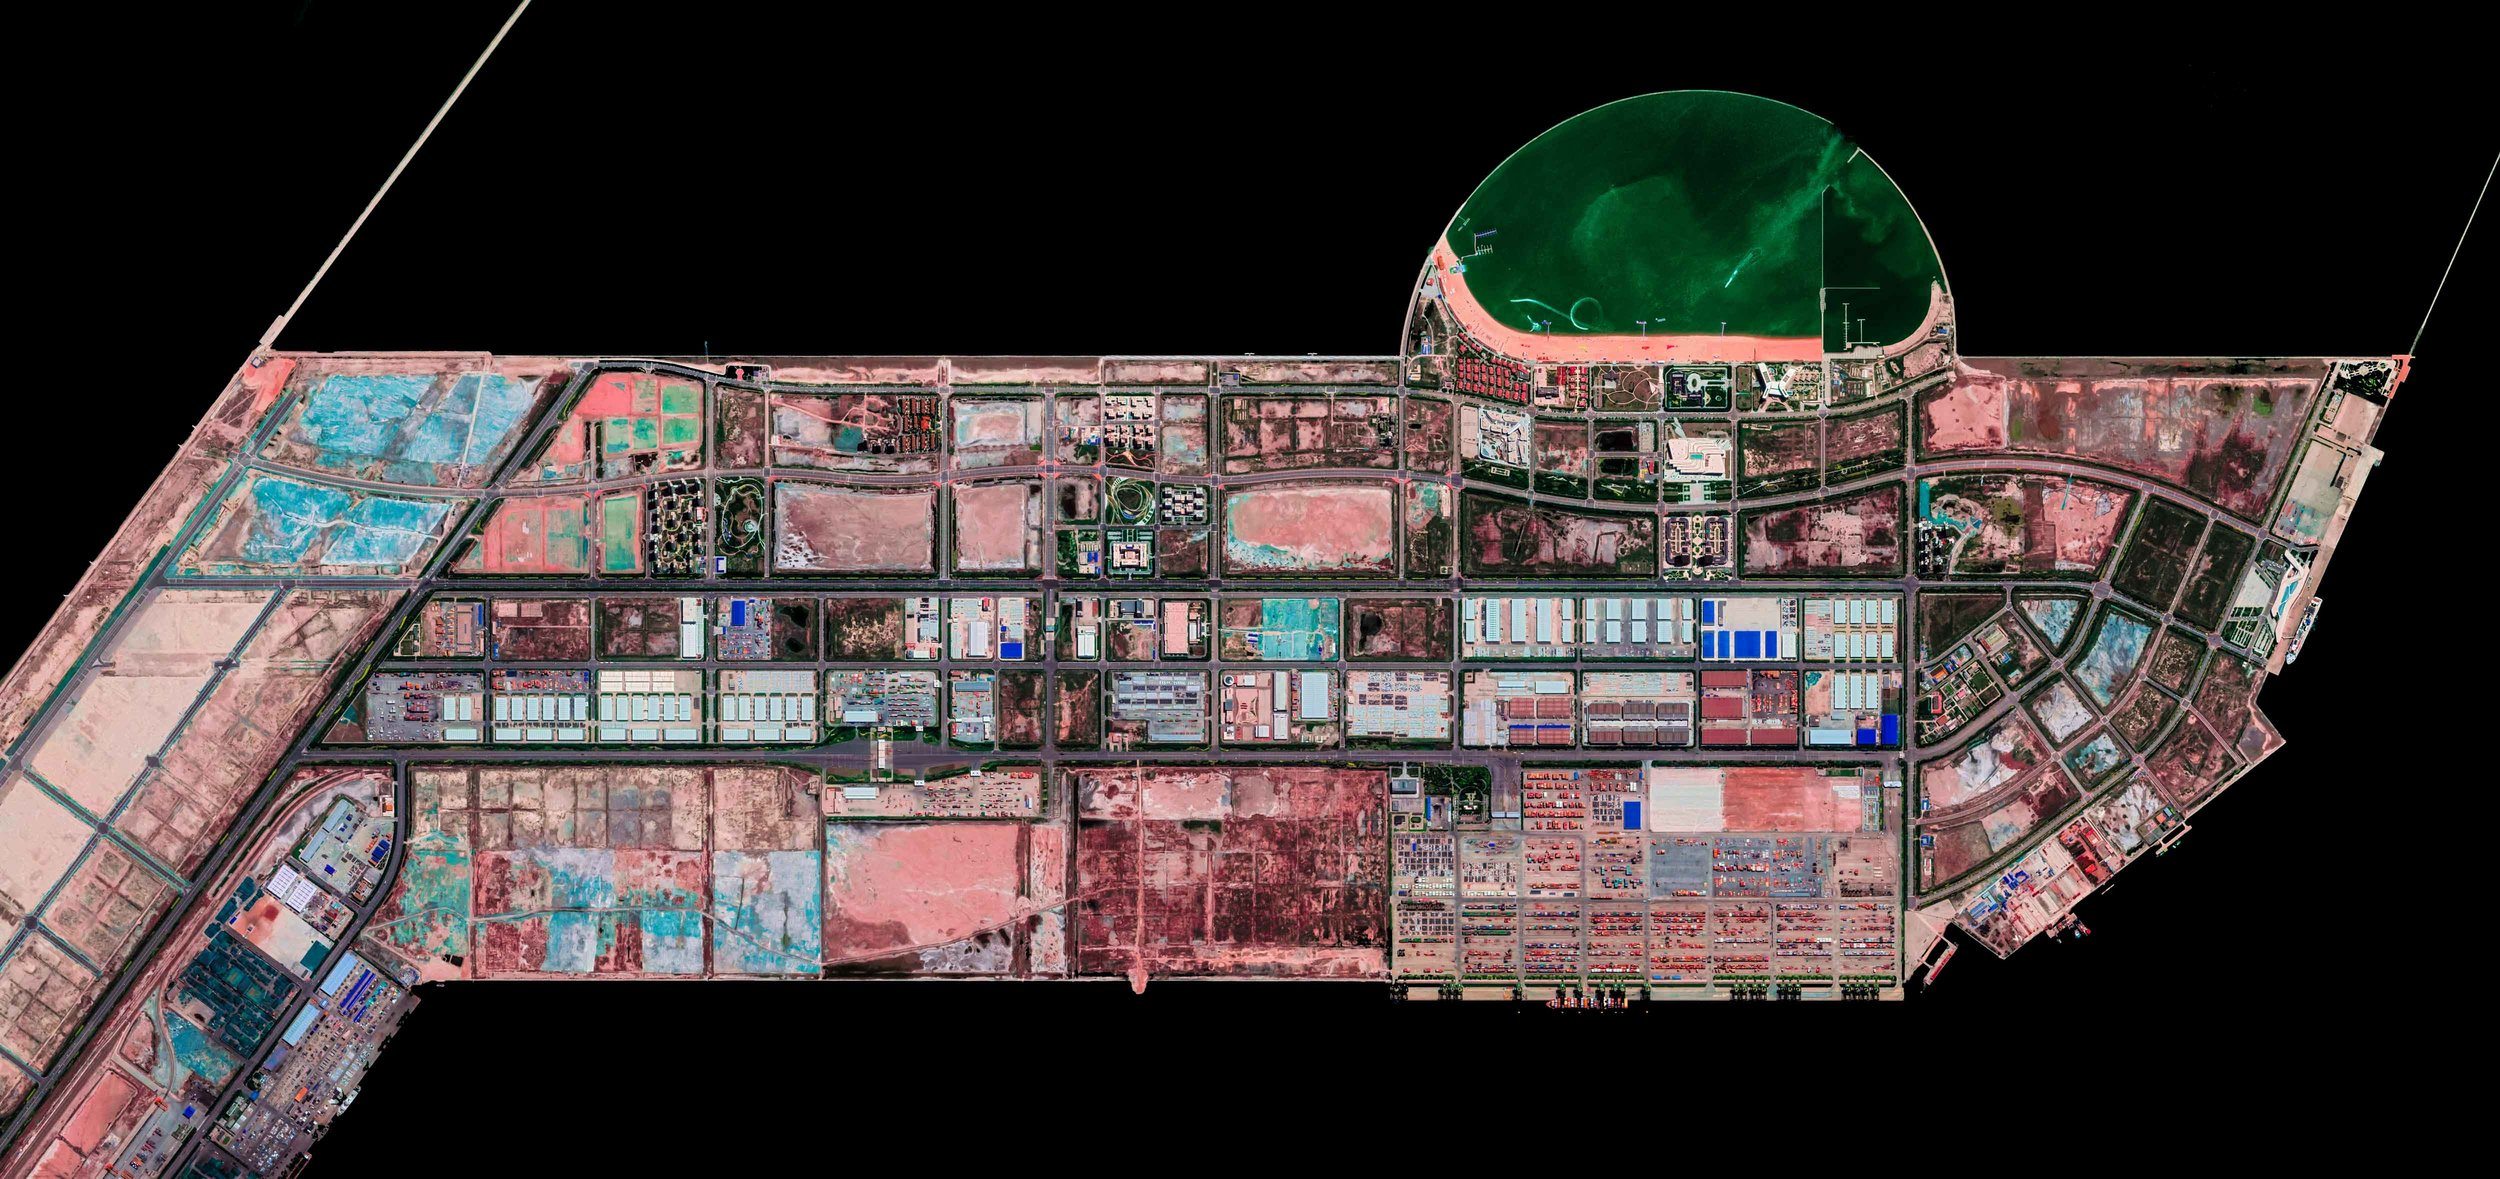 Tianjin II